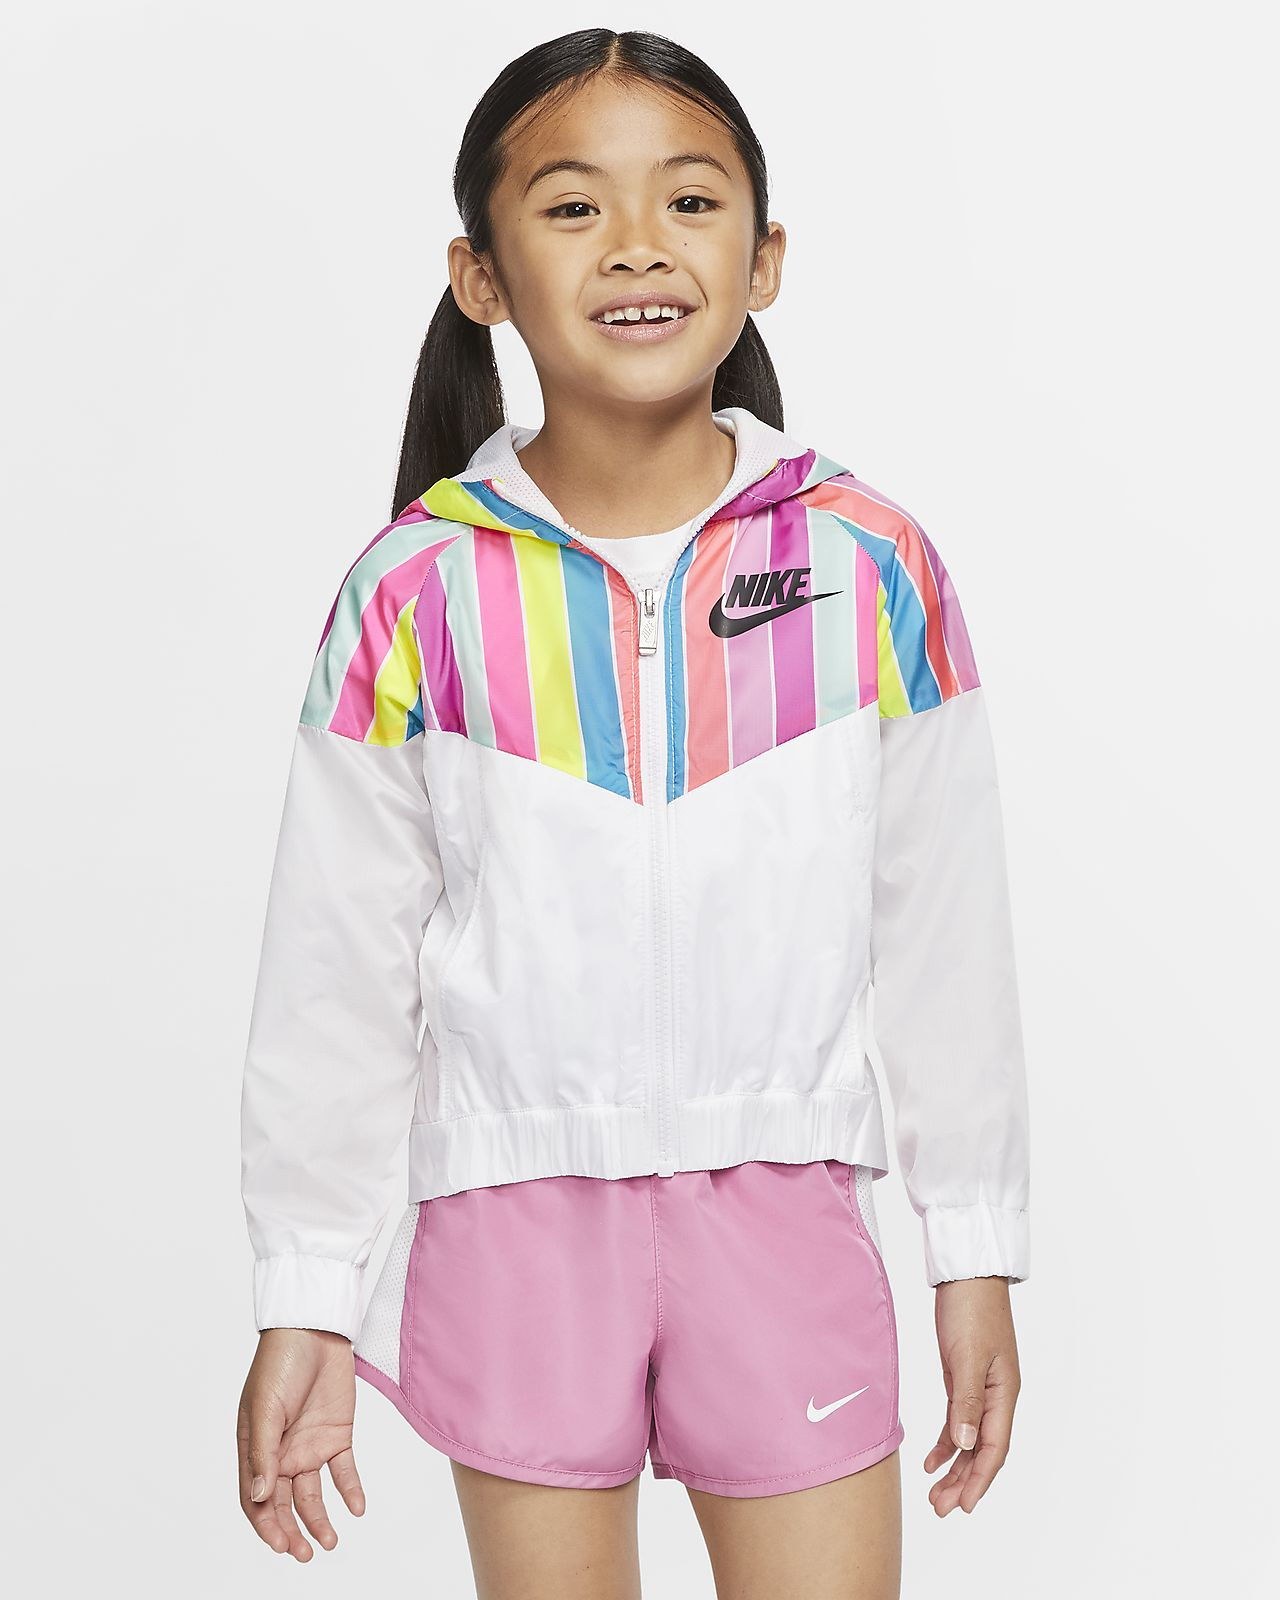 Chamarra para niños talla pequeña Nike Sportswear Windrunner